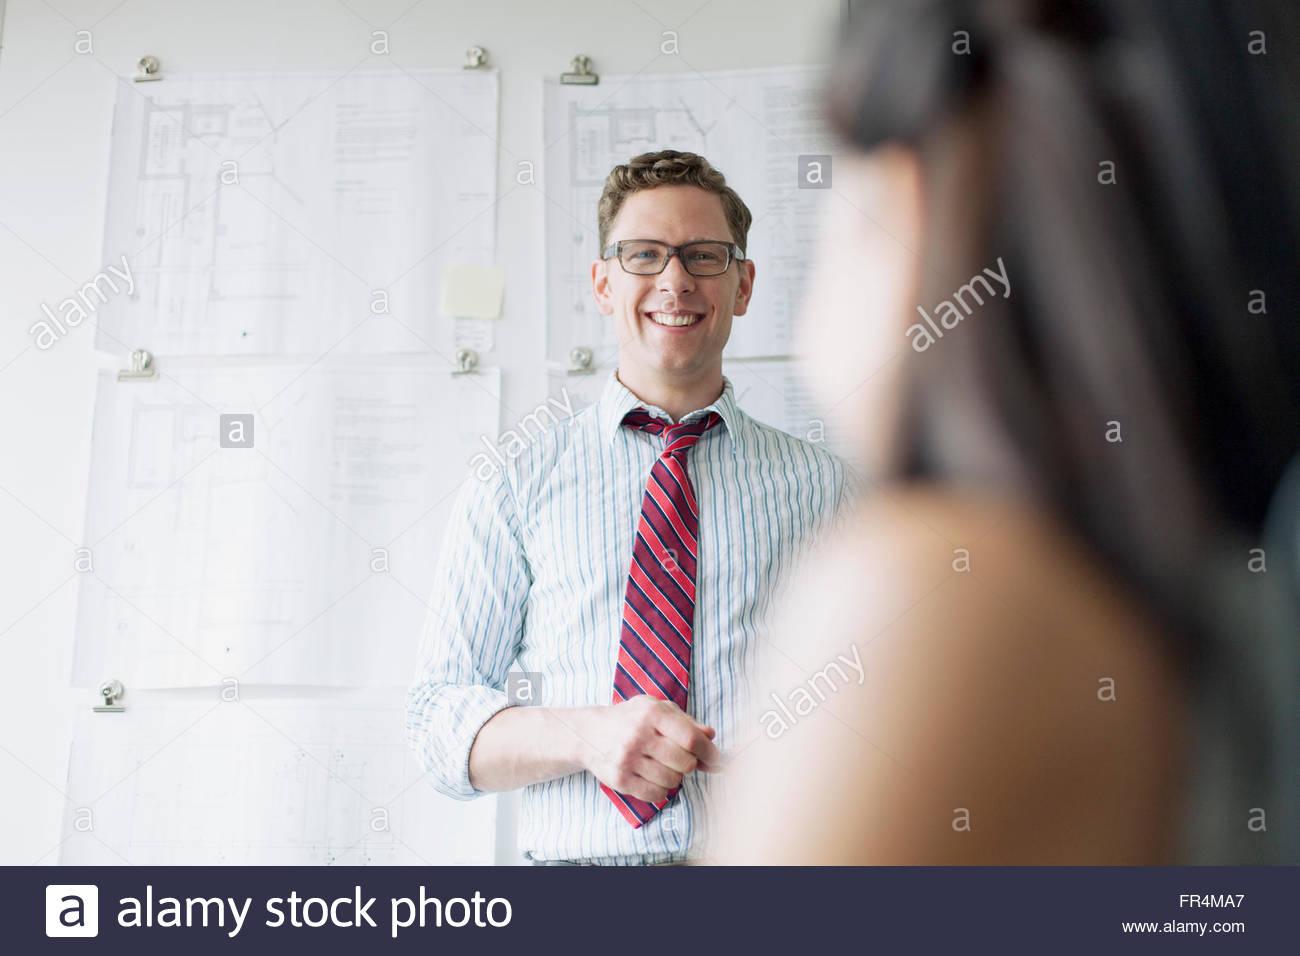 architect smiling during presentation - Stock Image